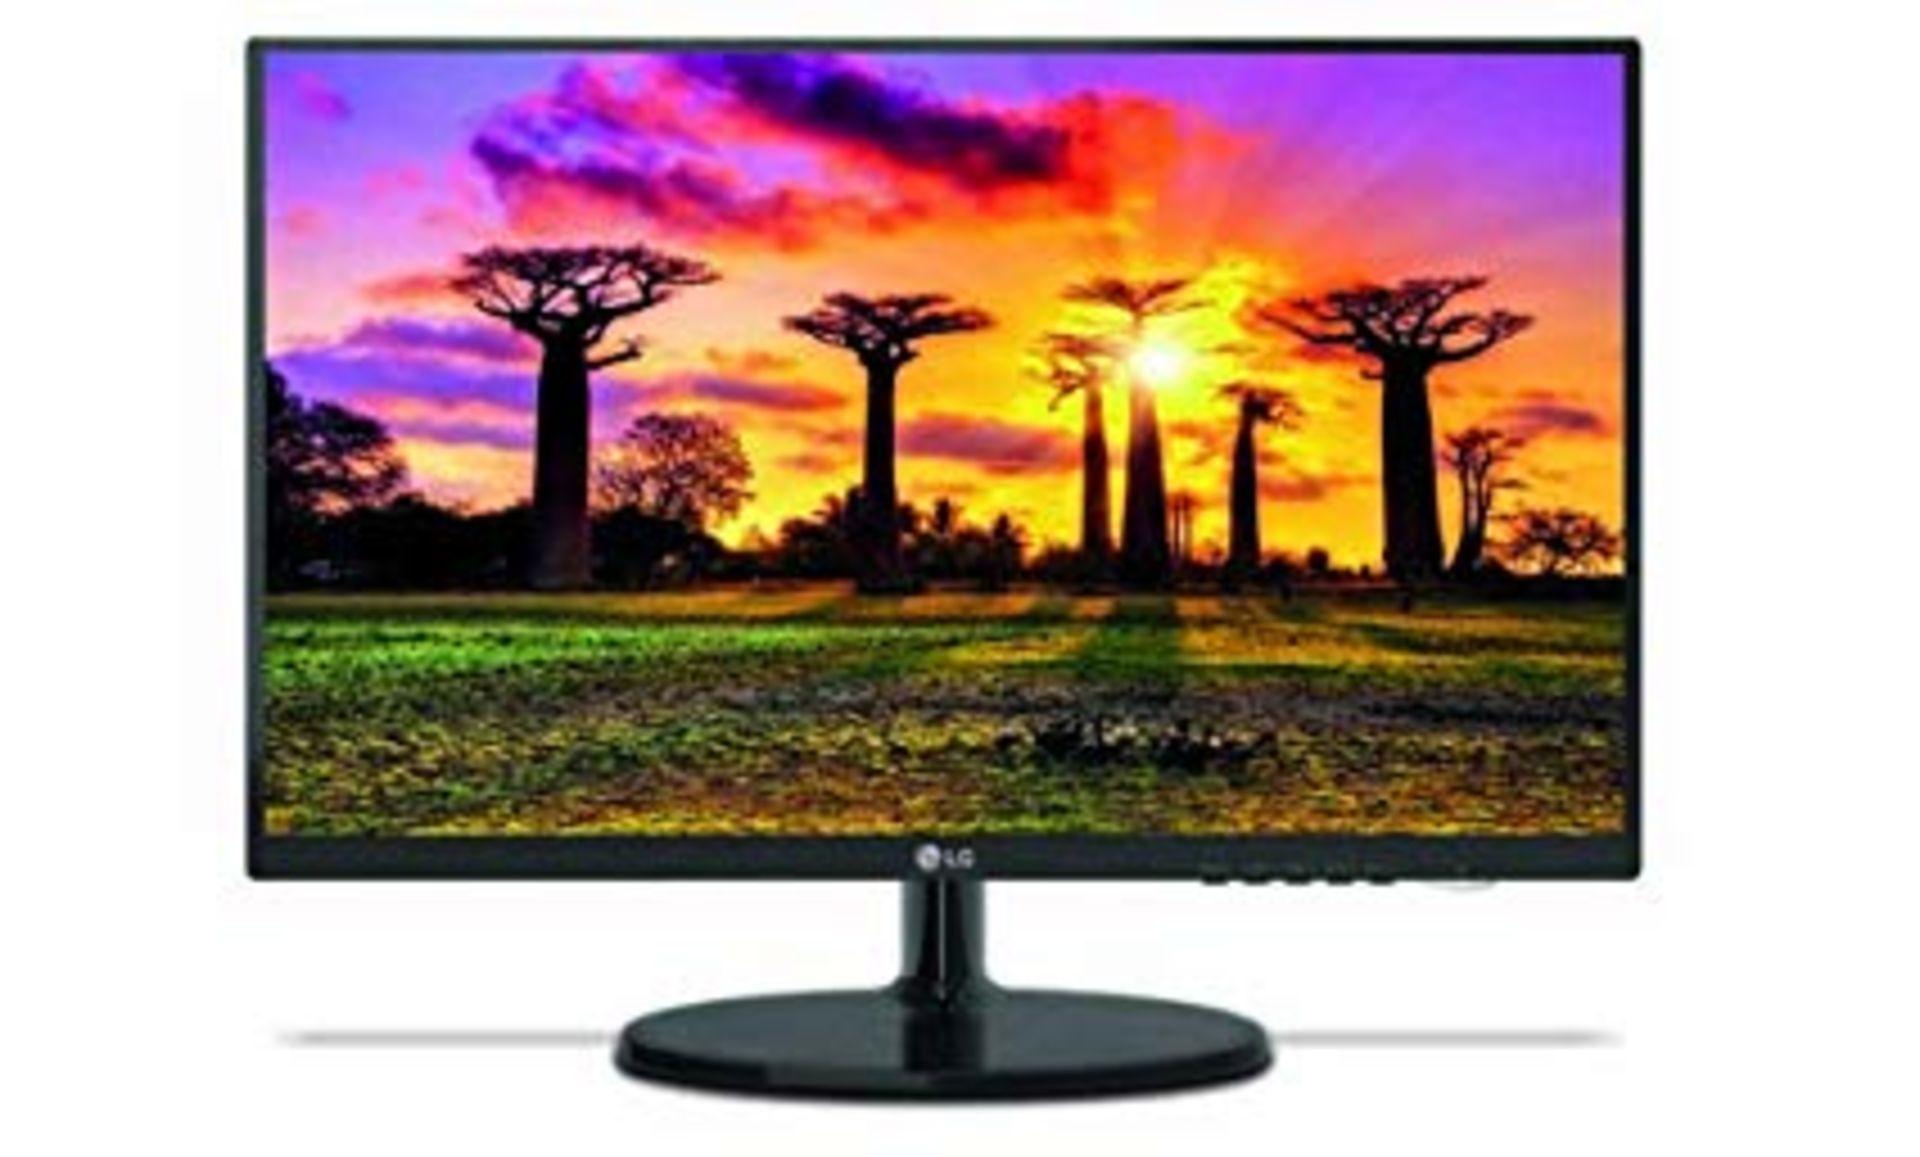 Lot 29920 - V Grade A LG 27 Inch FULL HD IPS LED MONITOR - D-SUB, DVI-D, HDMI 27MP38VQ